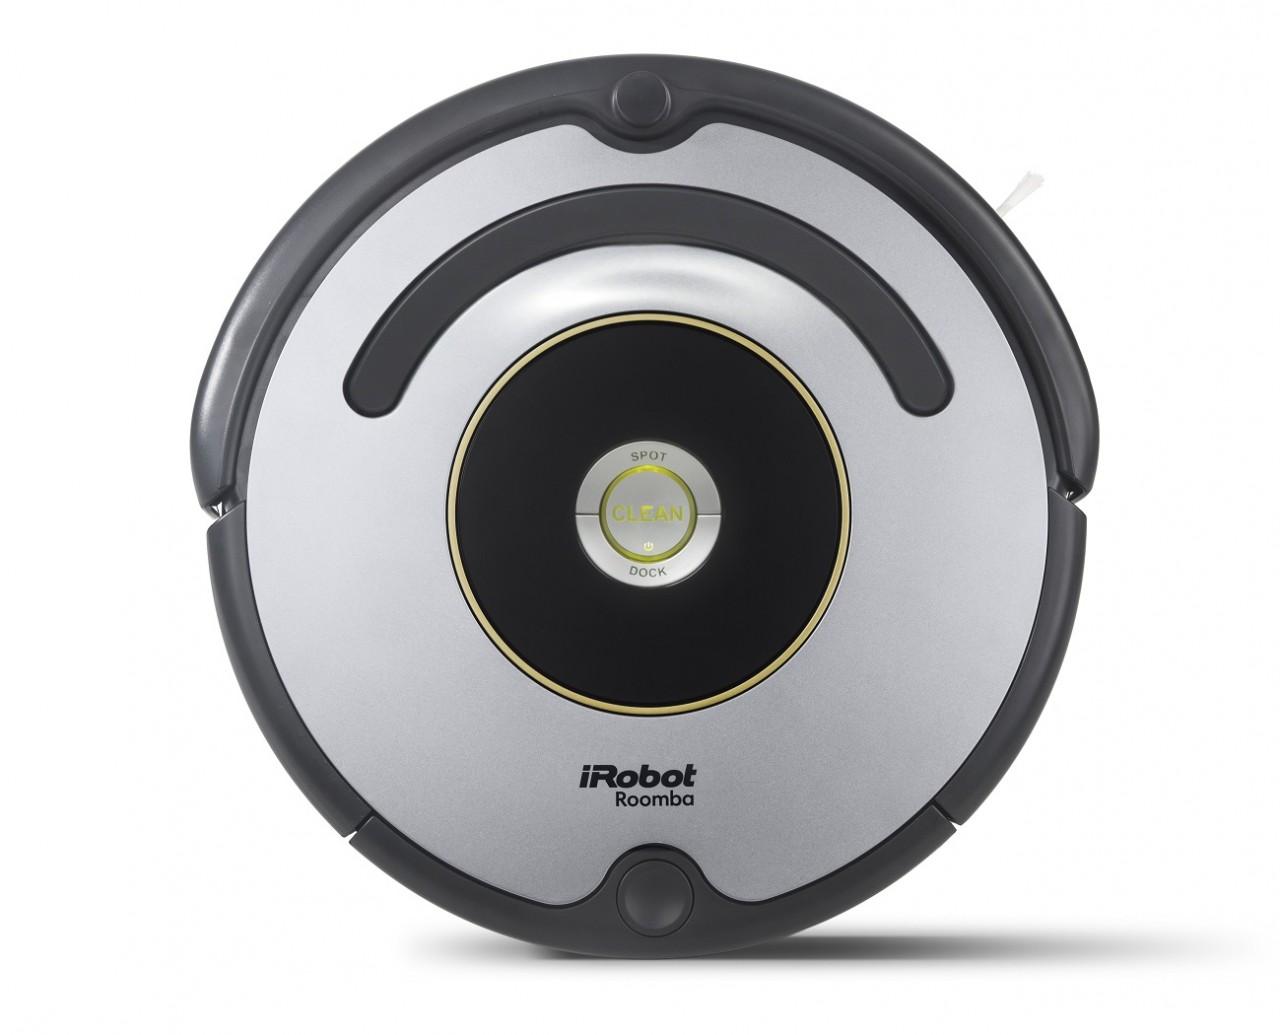 iRobot_Roomba 616